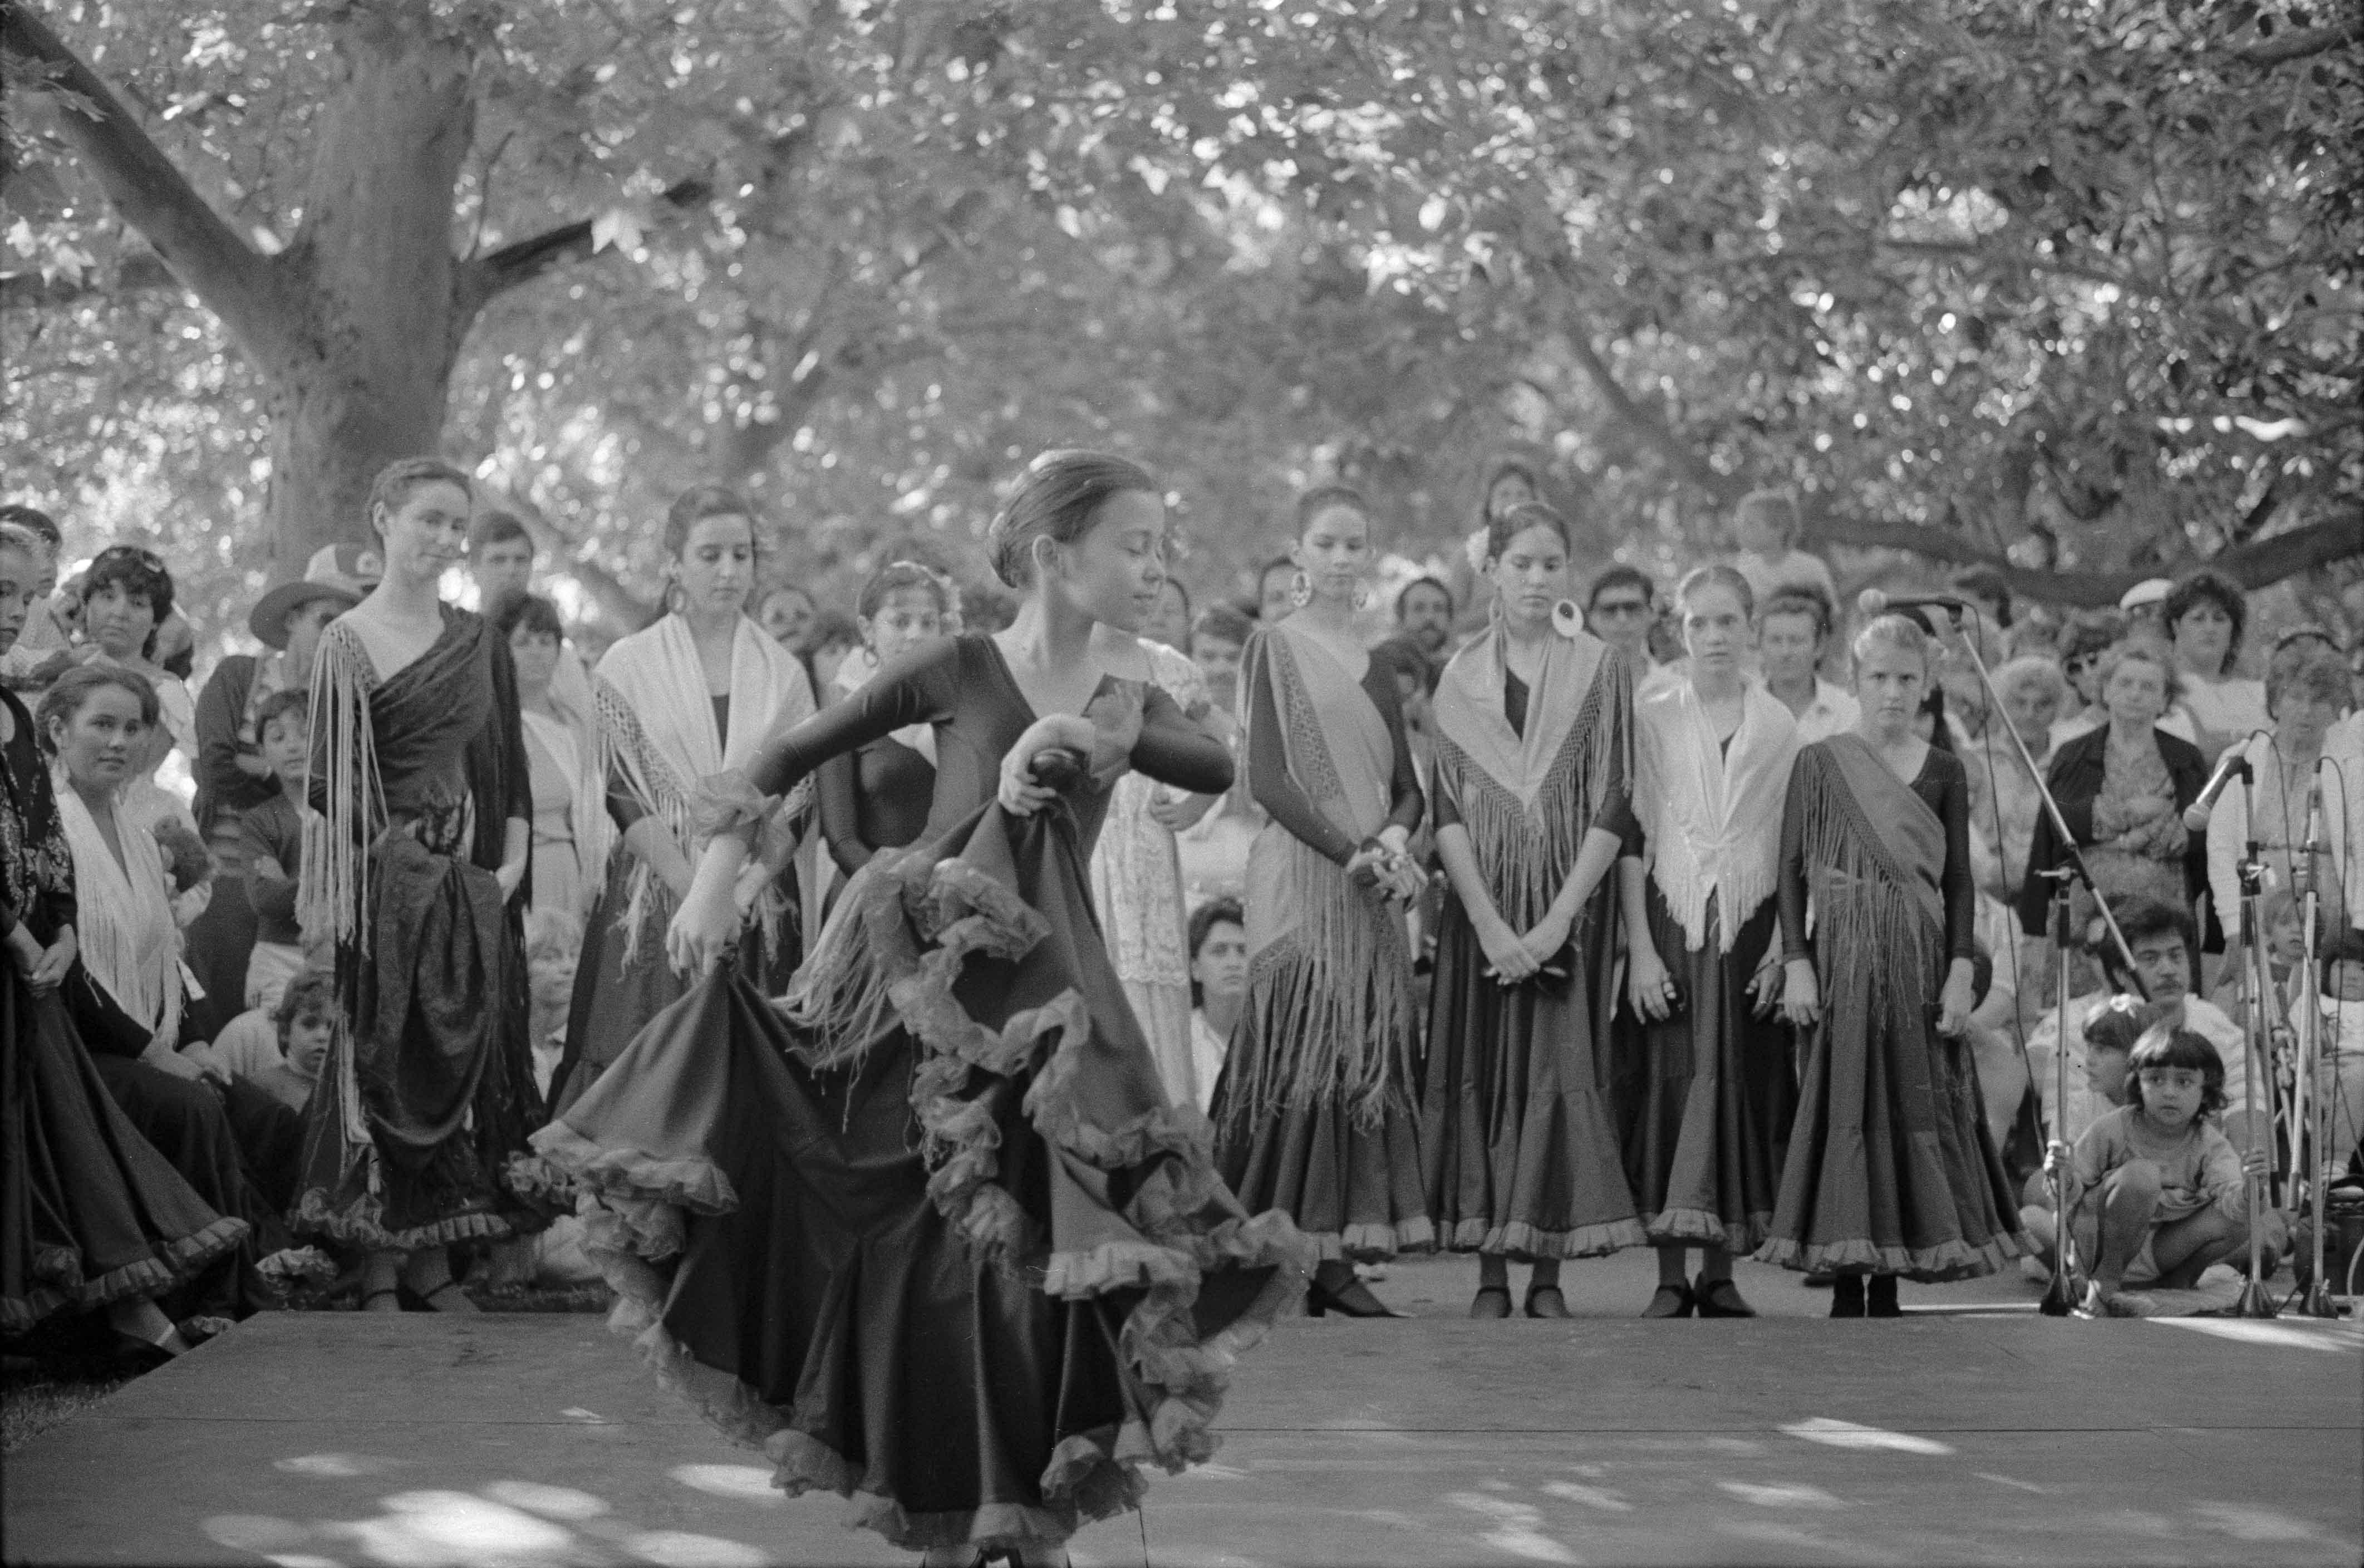 128. Festival Hyde Park, 1985